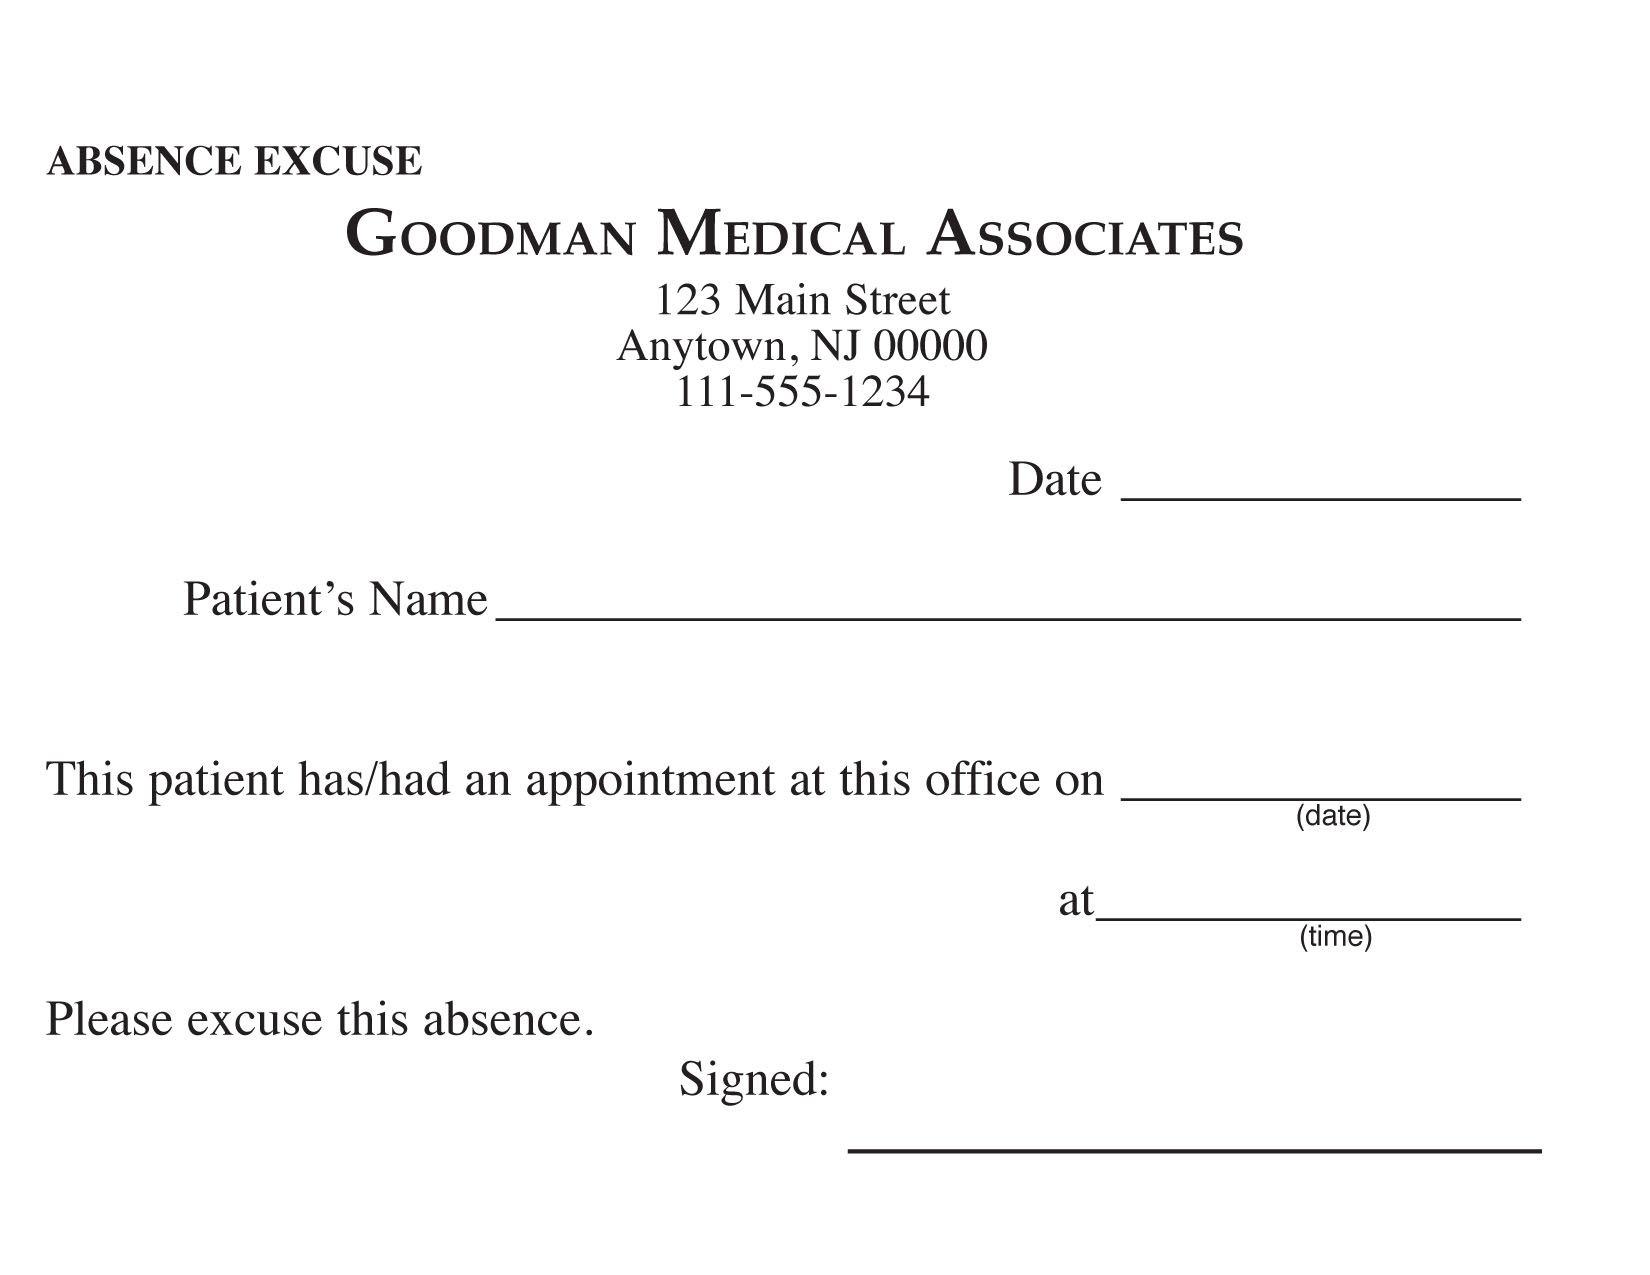 Blank Printable Doctor Excuse Form | Keskes Printing - Mds | Doctors Note, Doctors Note Template